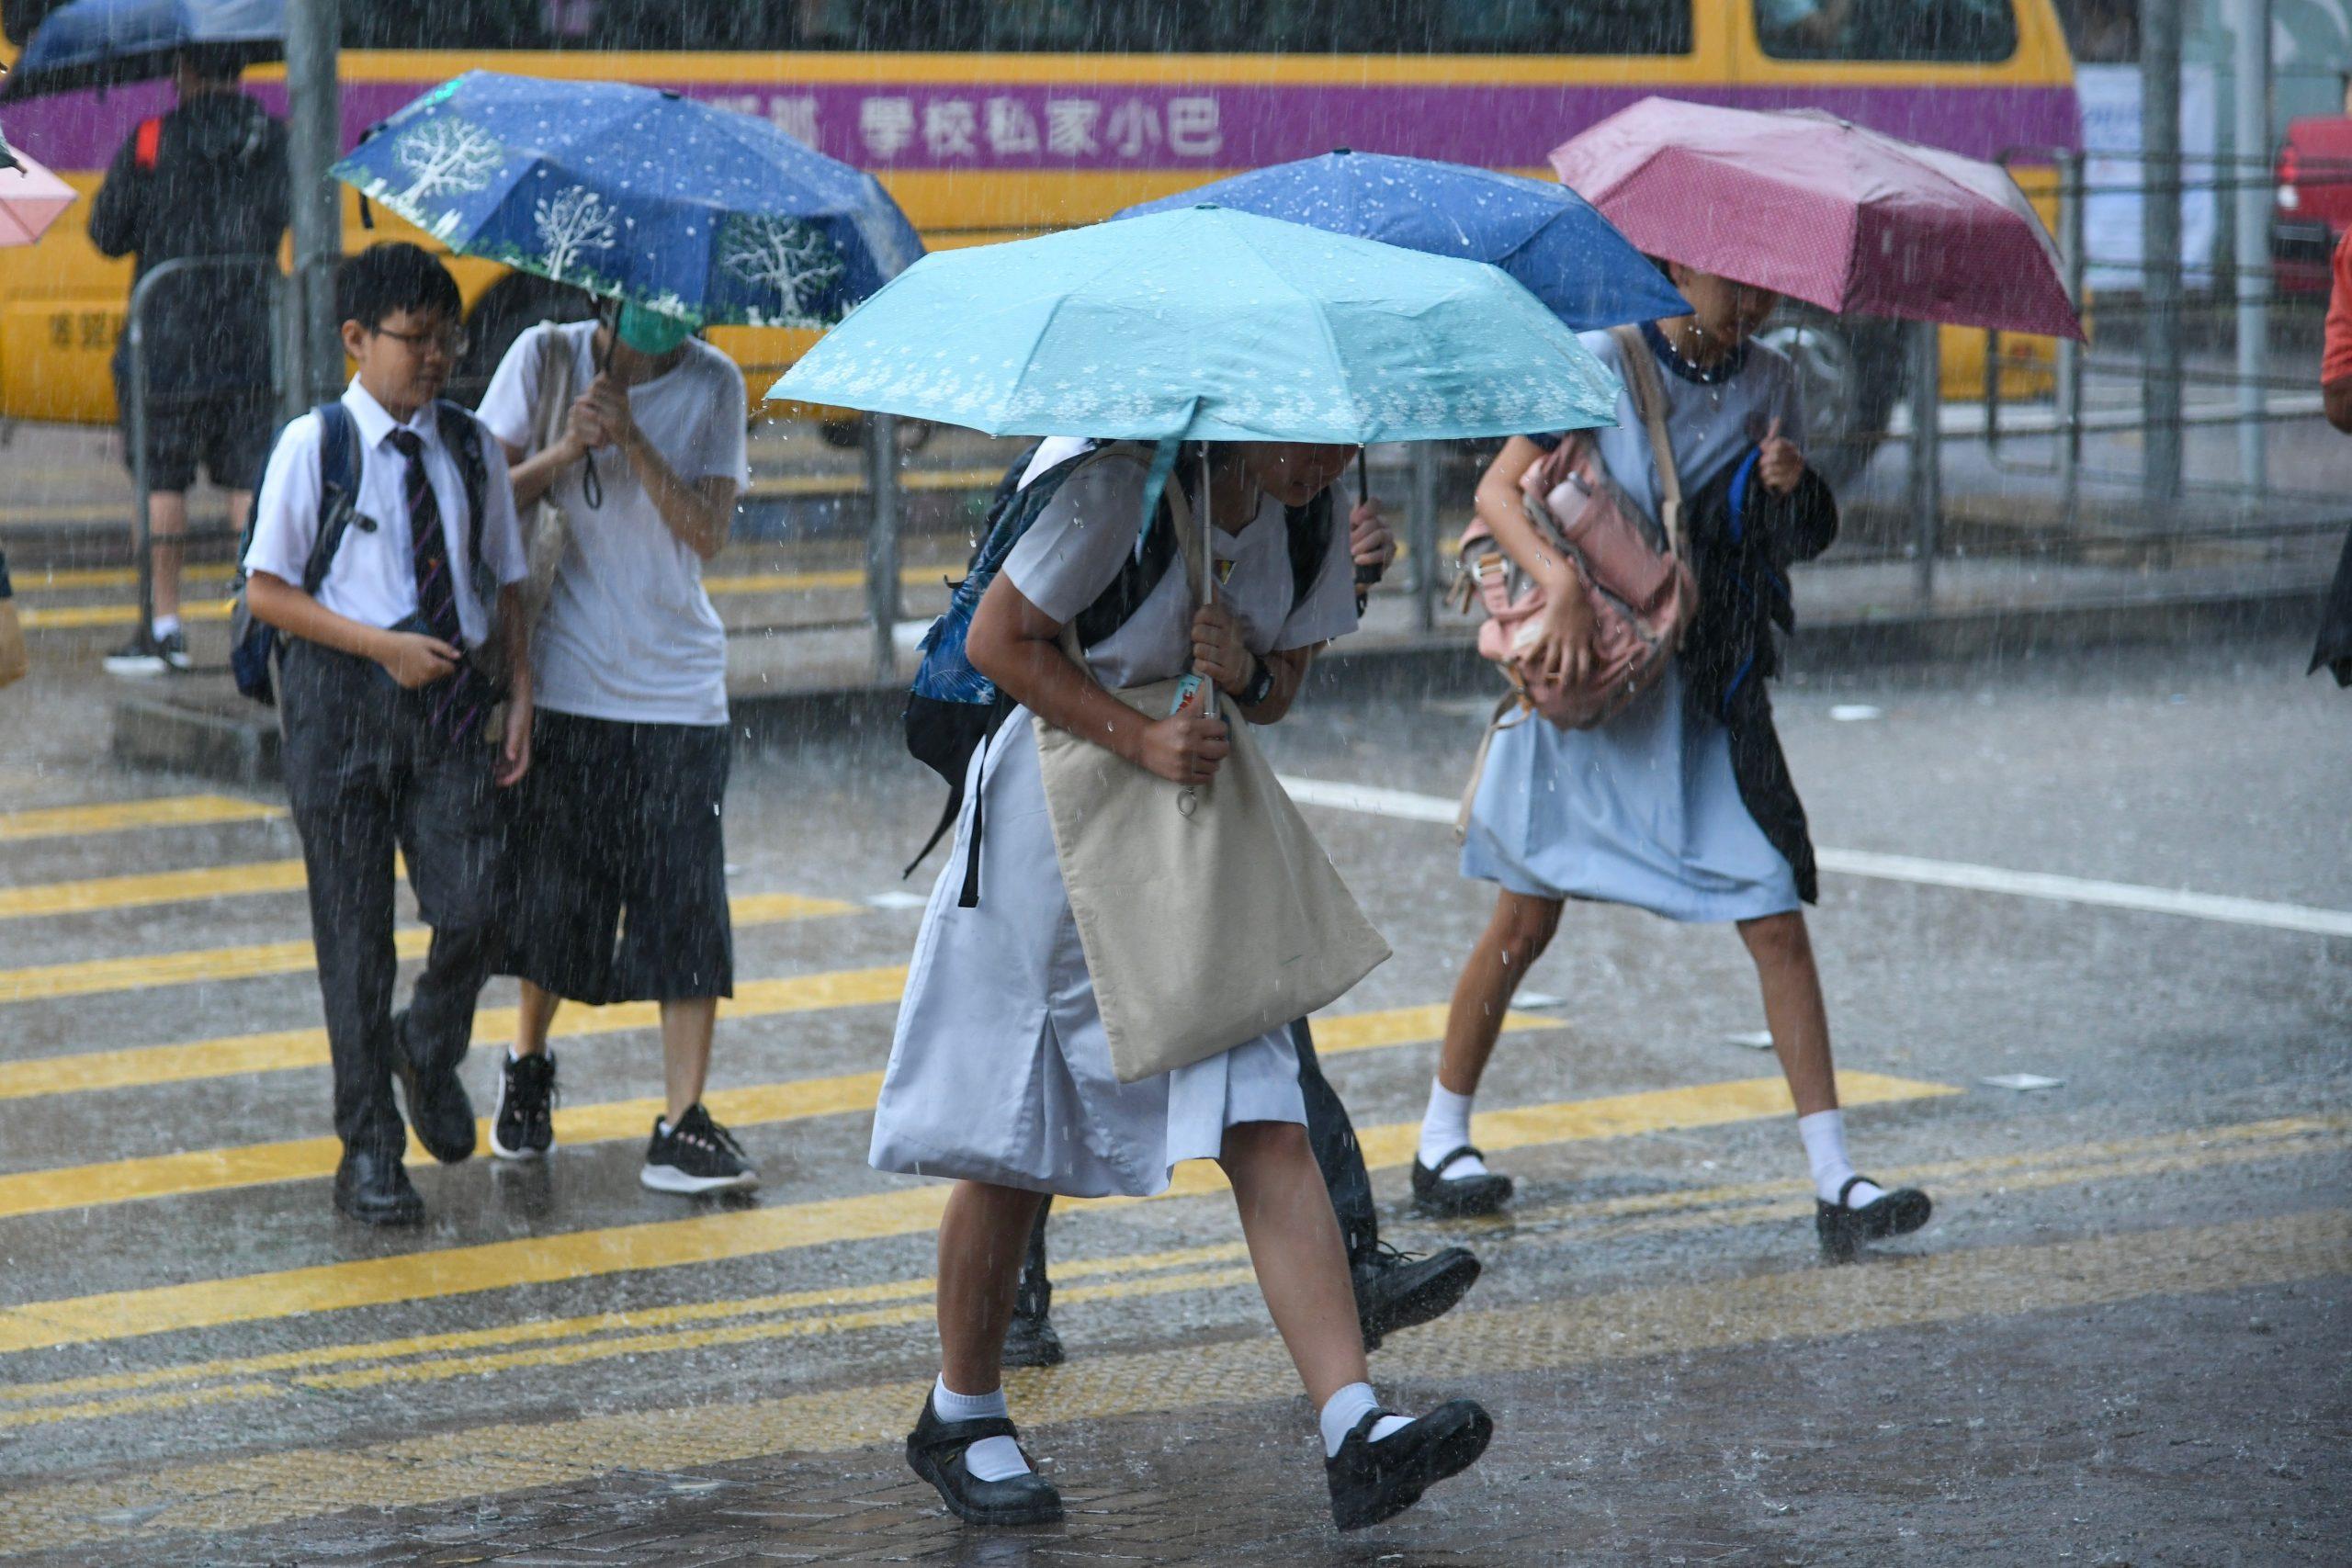 student school education uniform rain umbrella